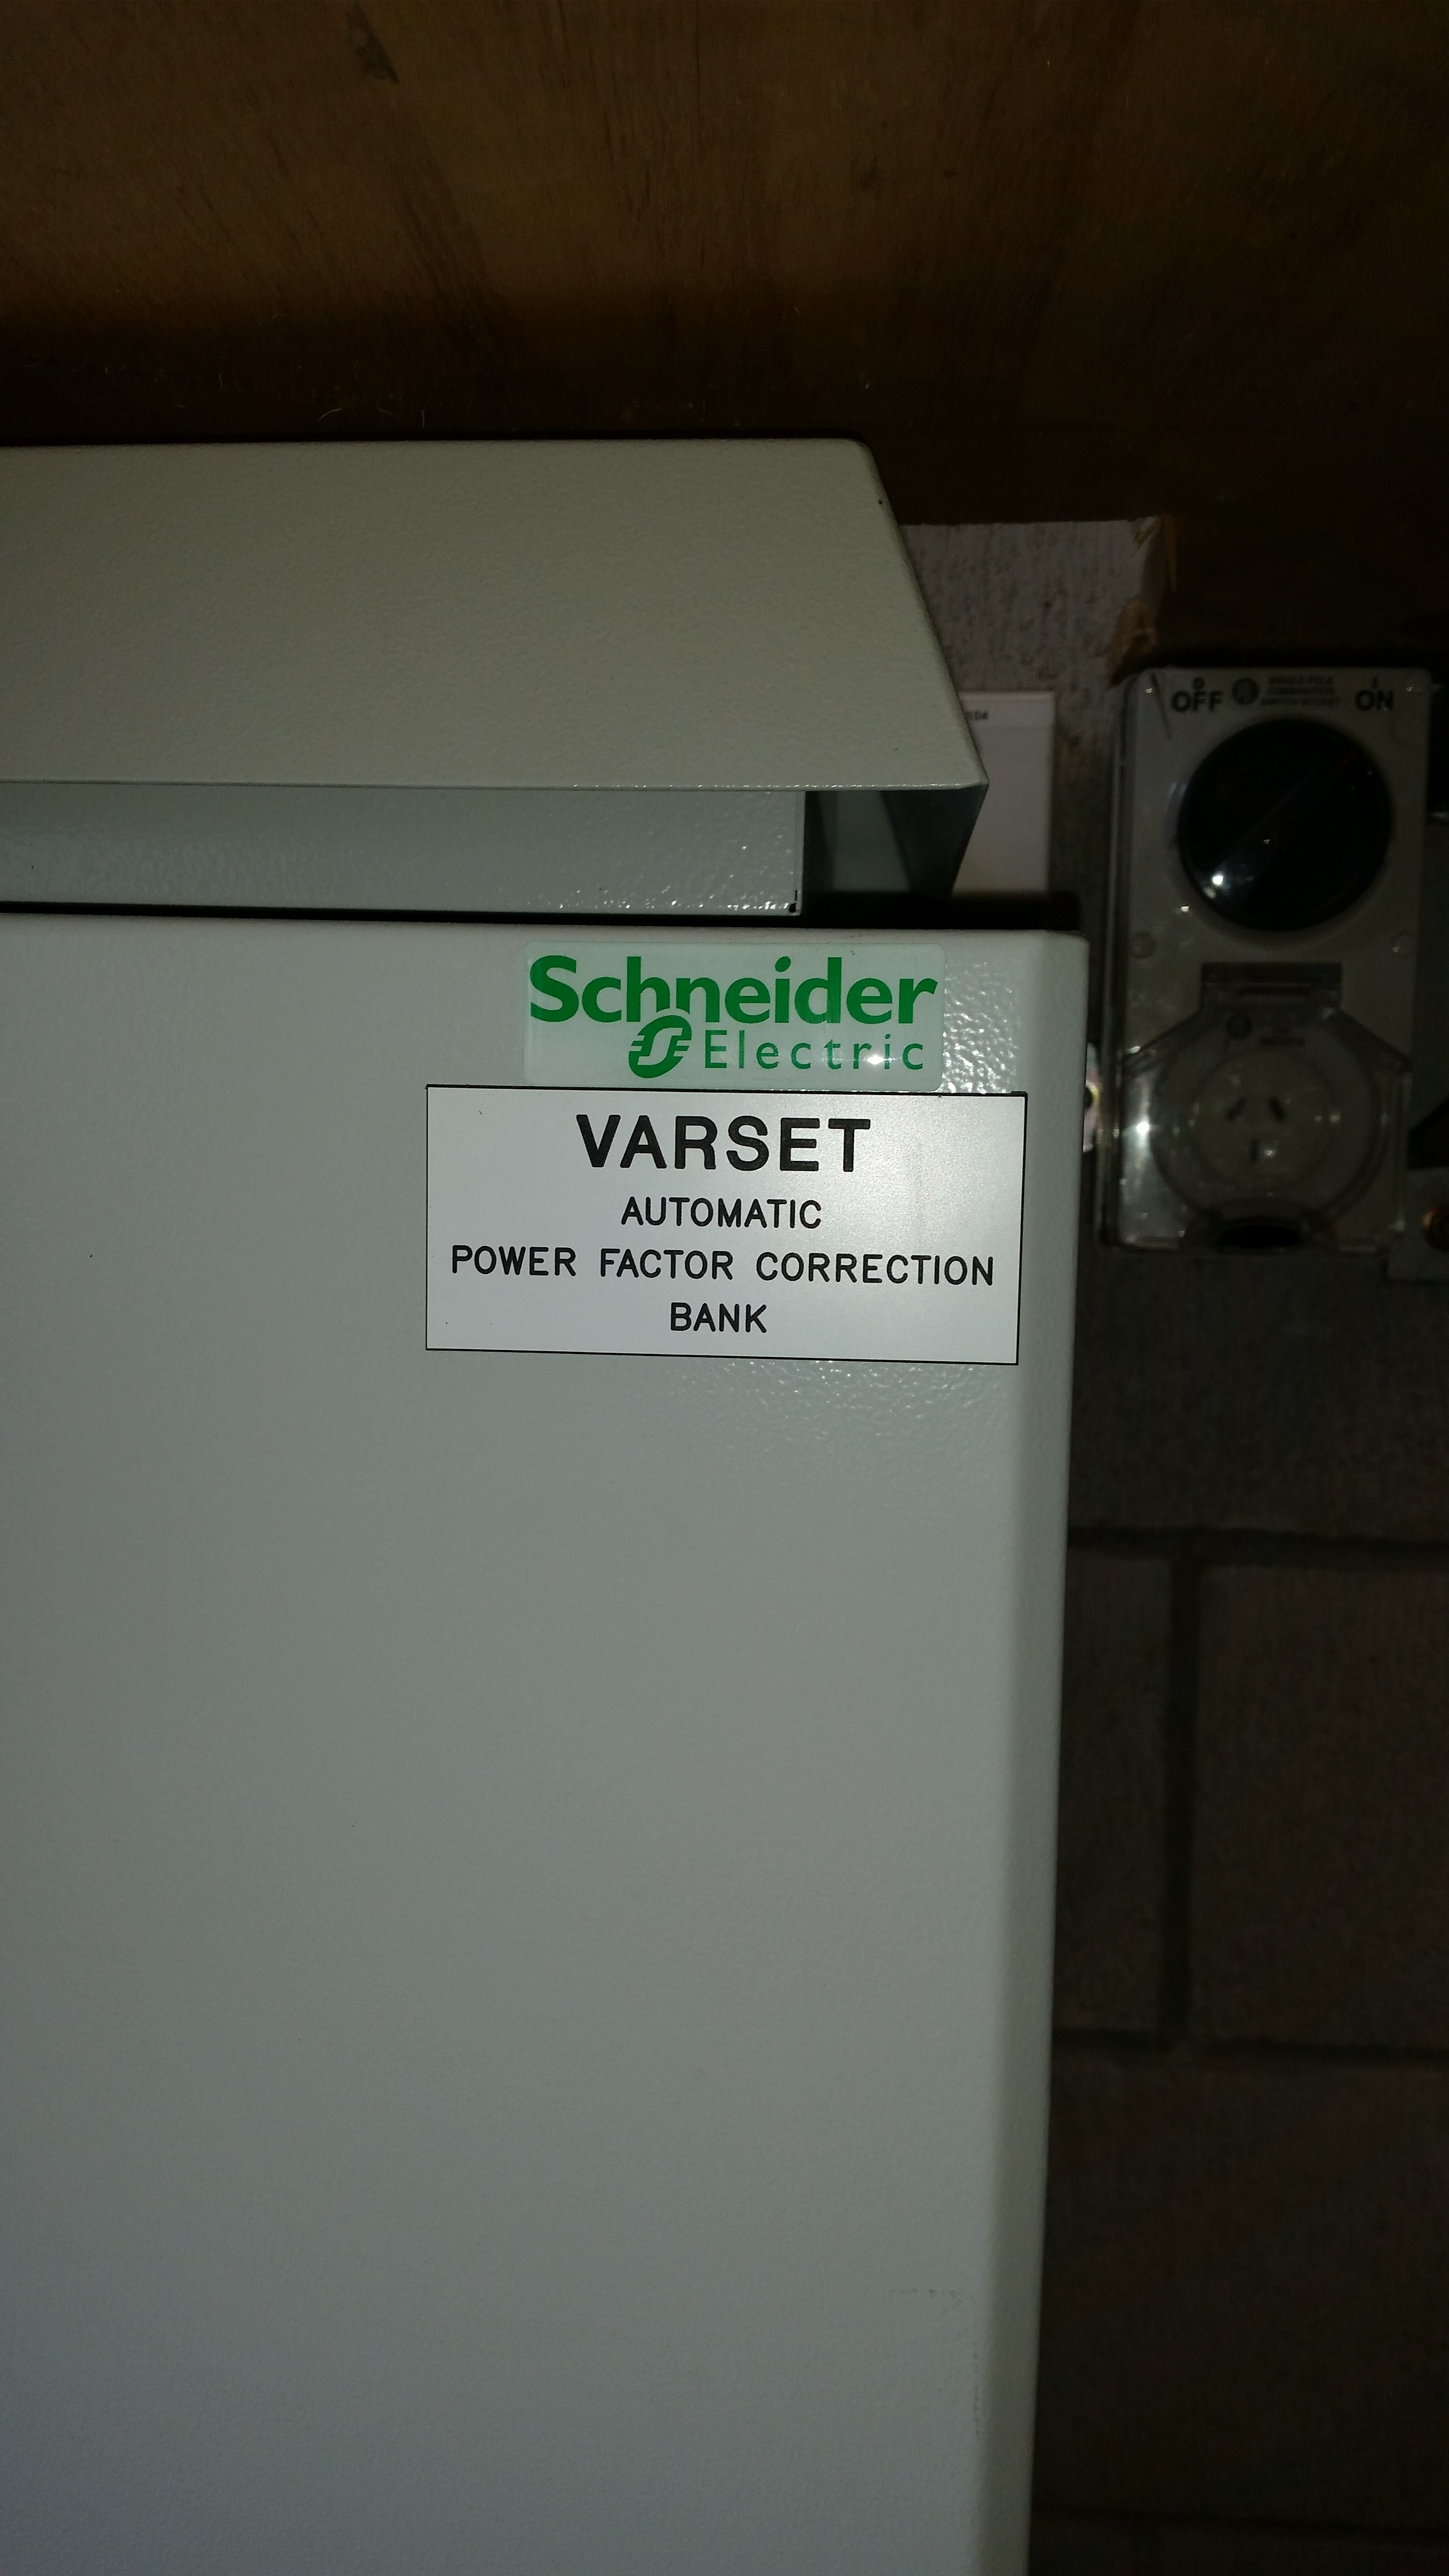 Schneider automatic power factor correction bank